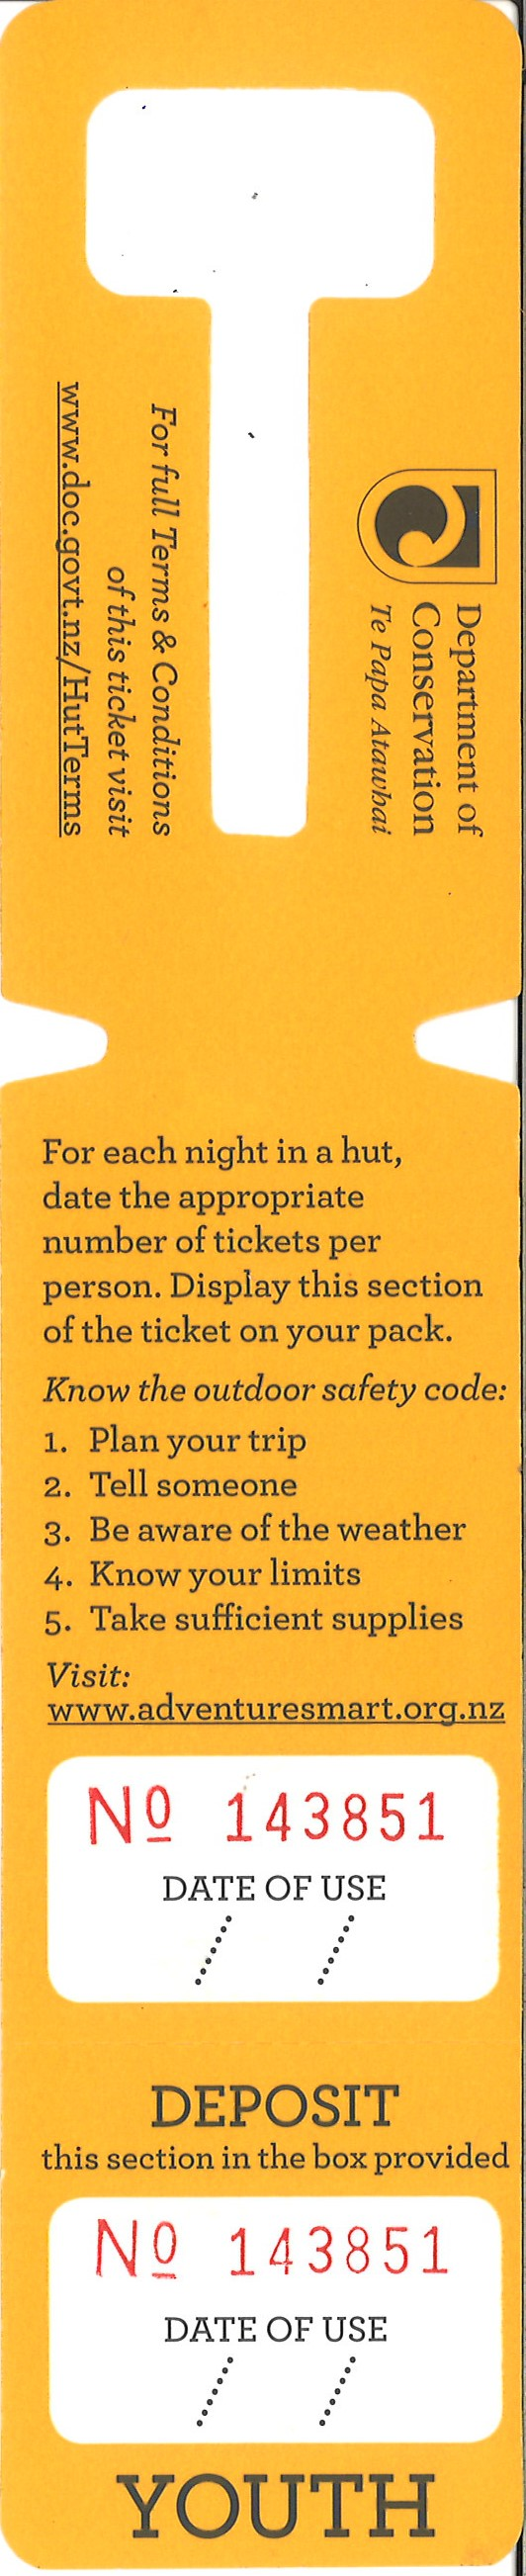 DoC Hut ticket - Standard Youth